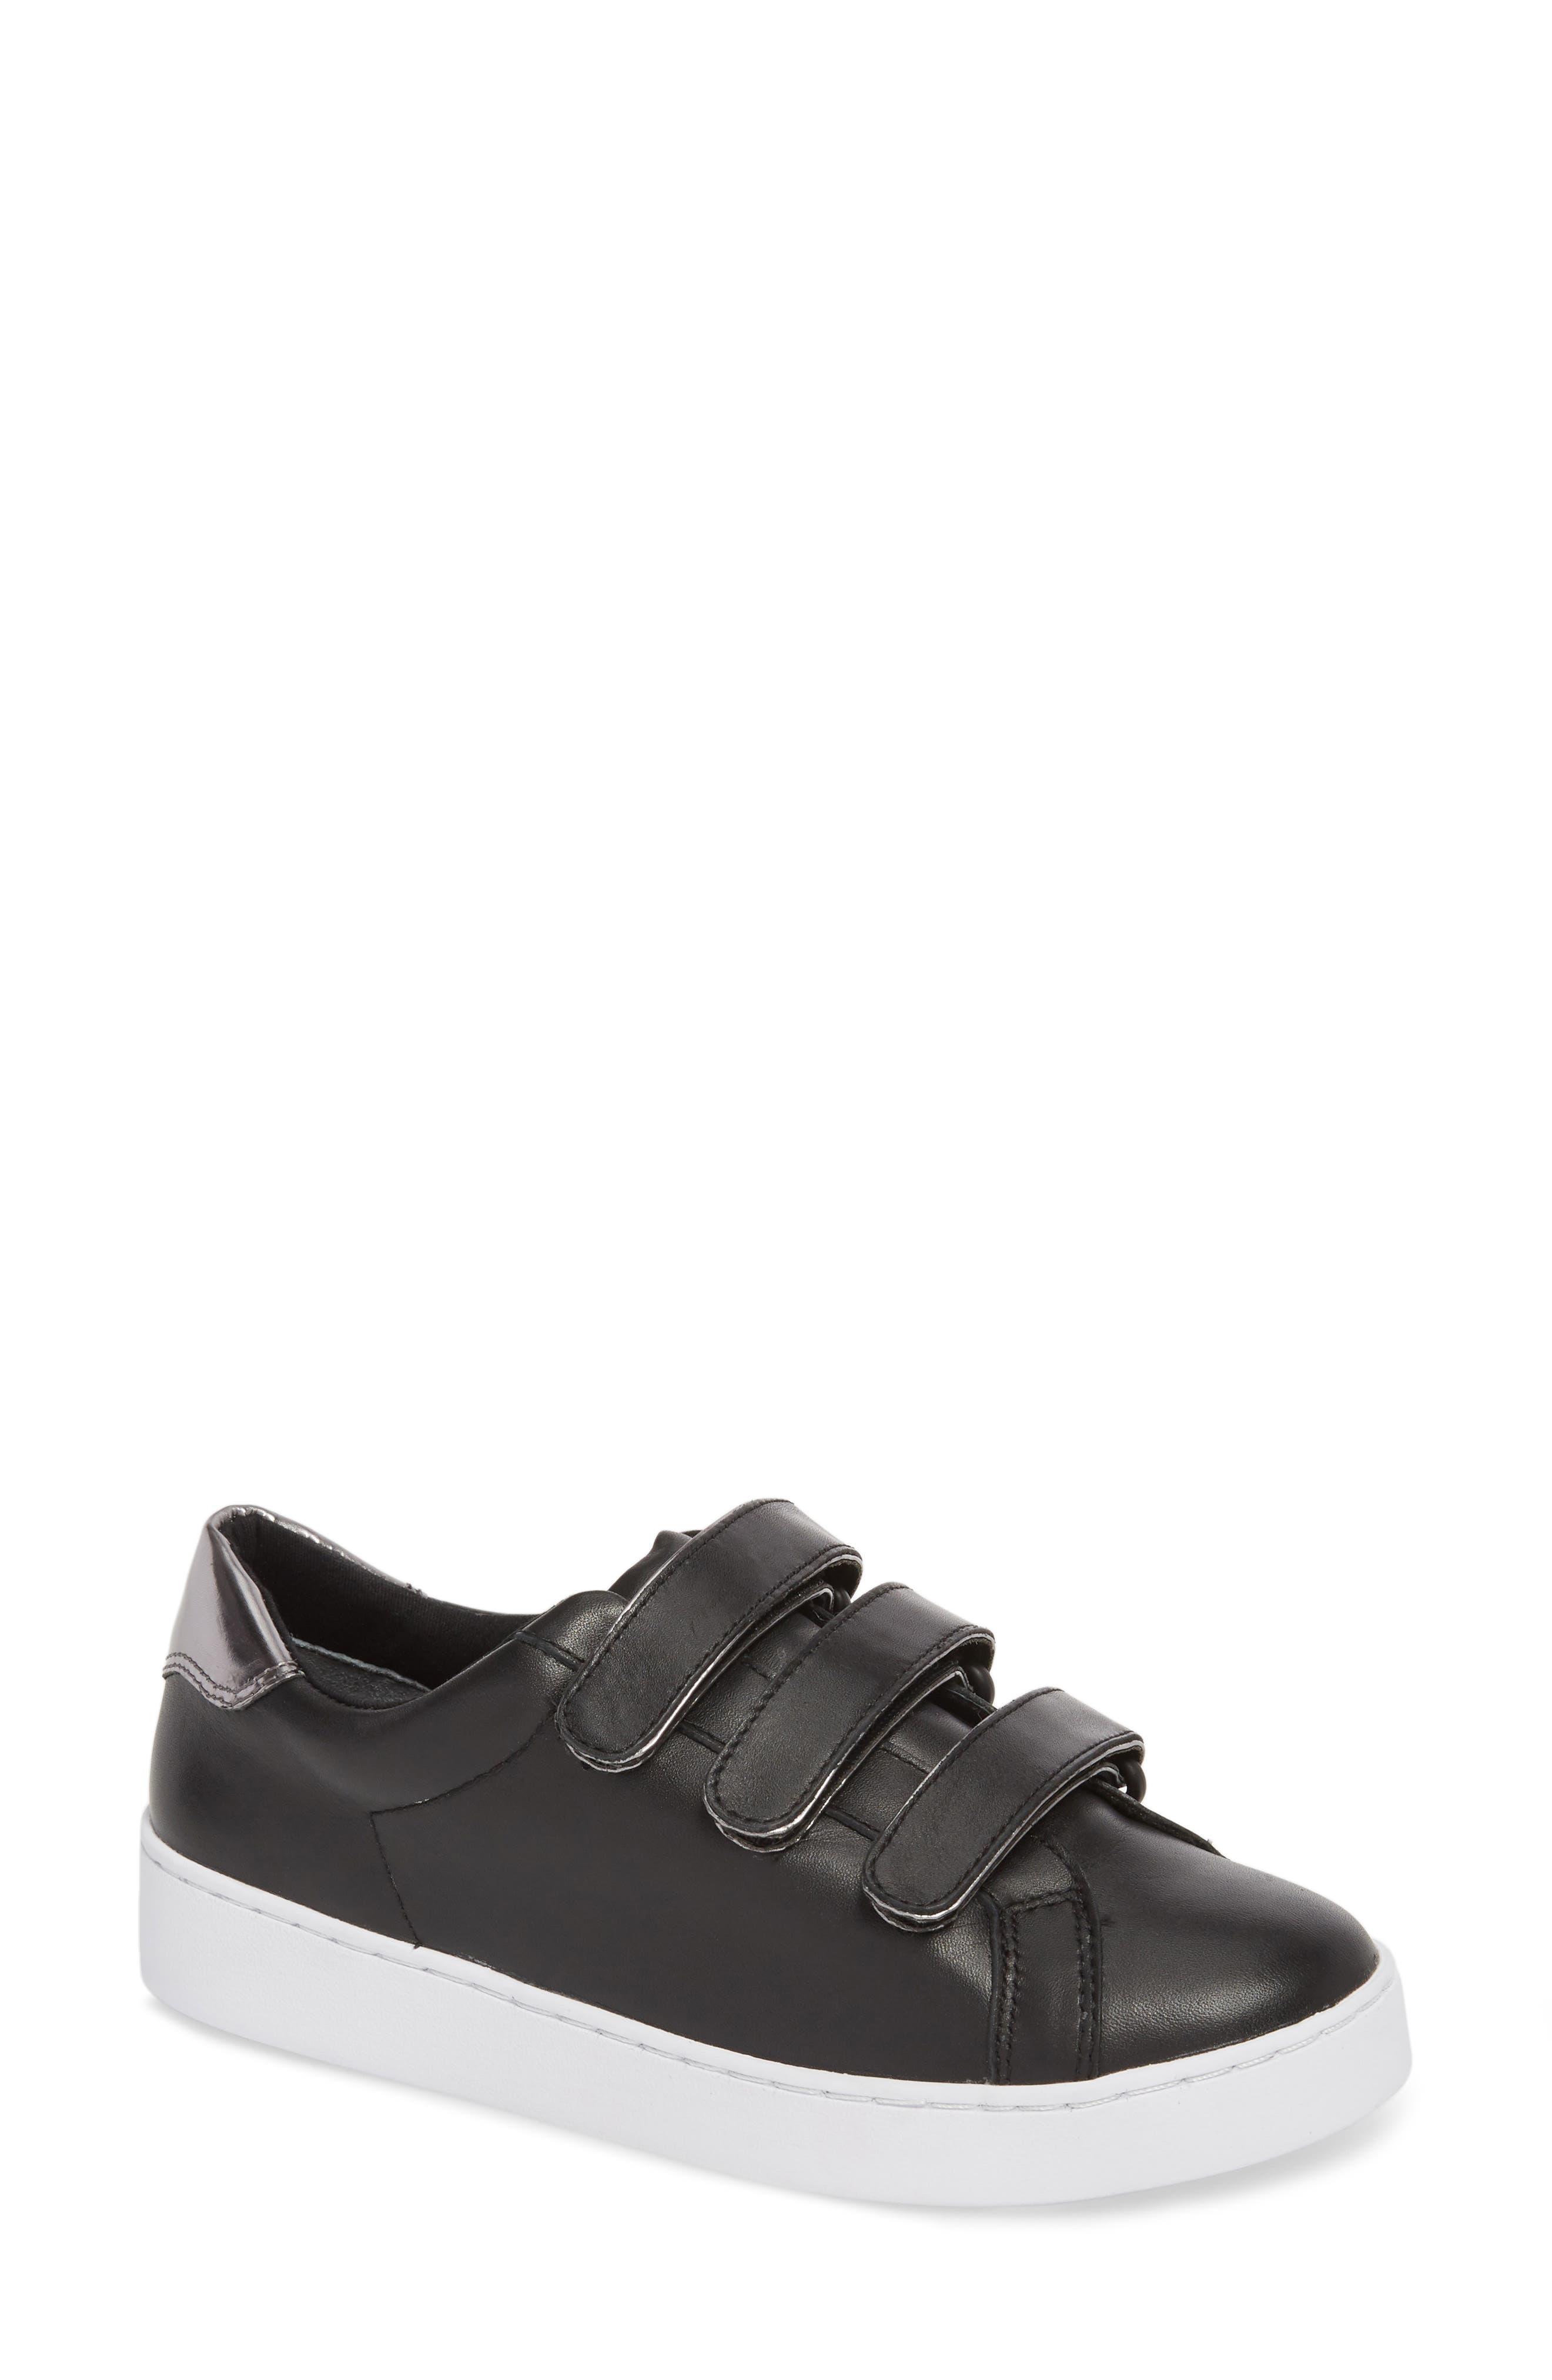 VIONIC Bobbi Sneaker, Main, color, 001